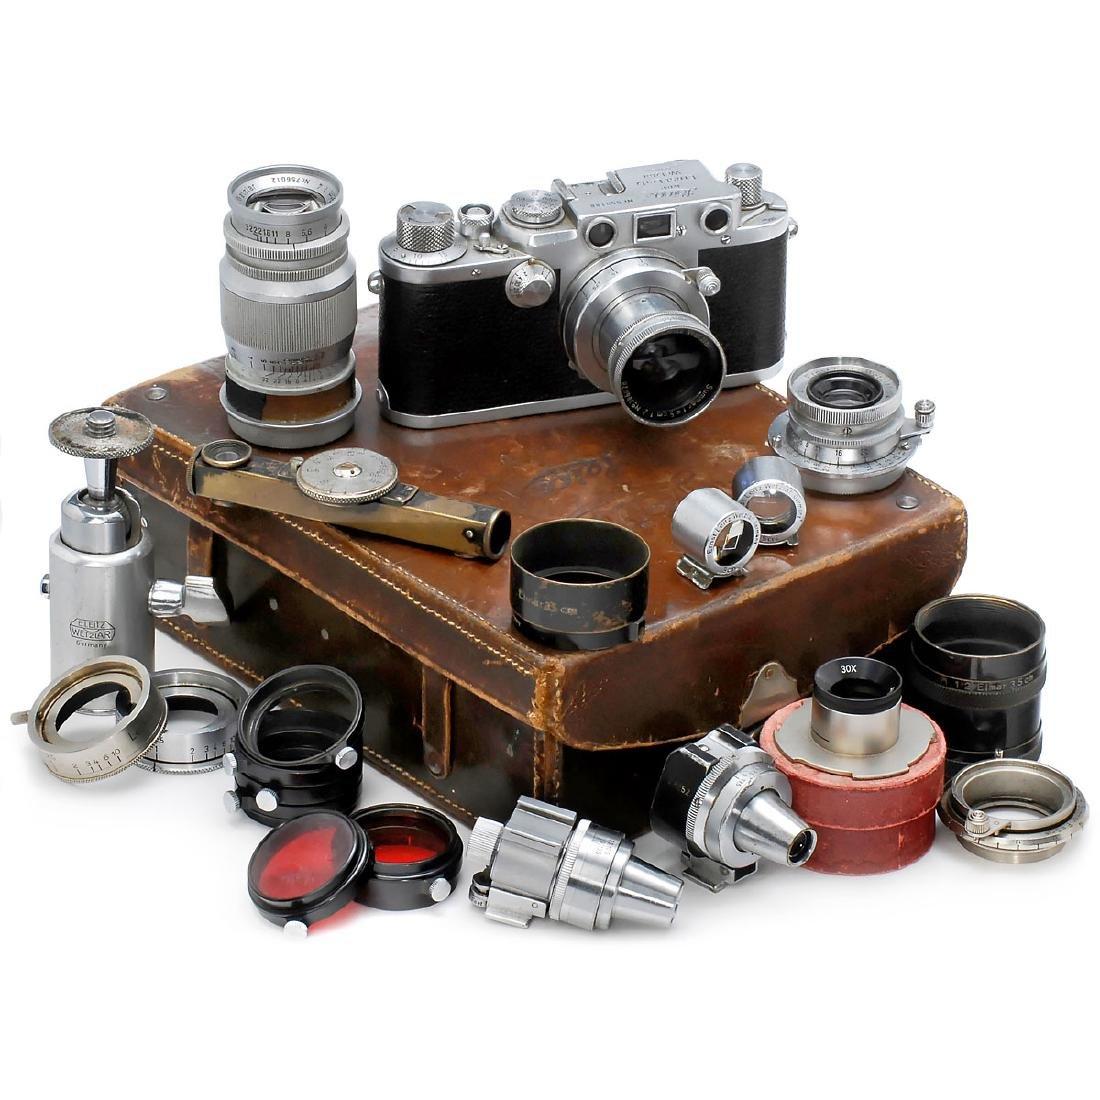 Leica IIIf Outfit of the Photo Journalist Peter Fischer - 2